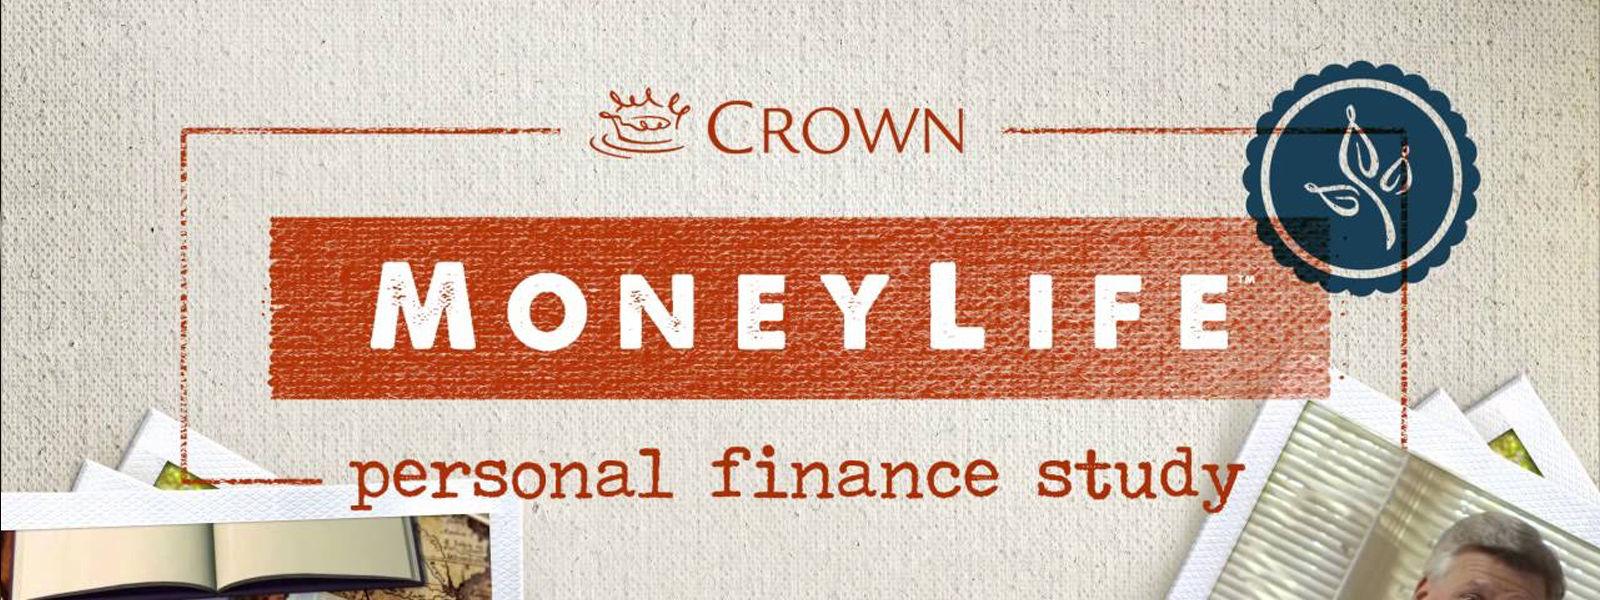 MoneyLife Personal Finance Study